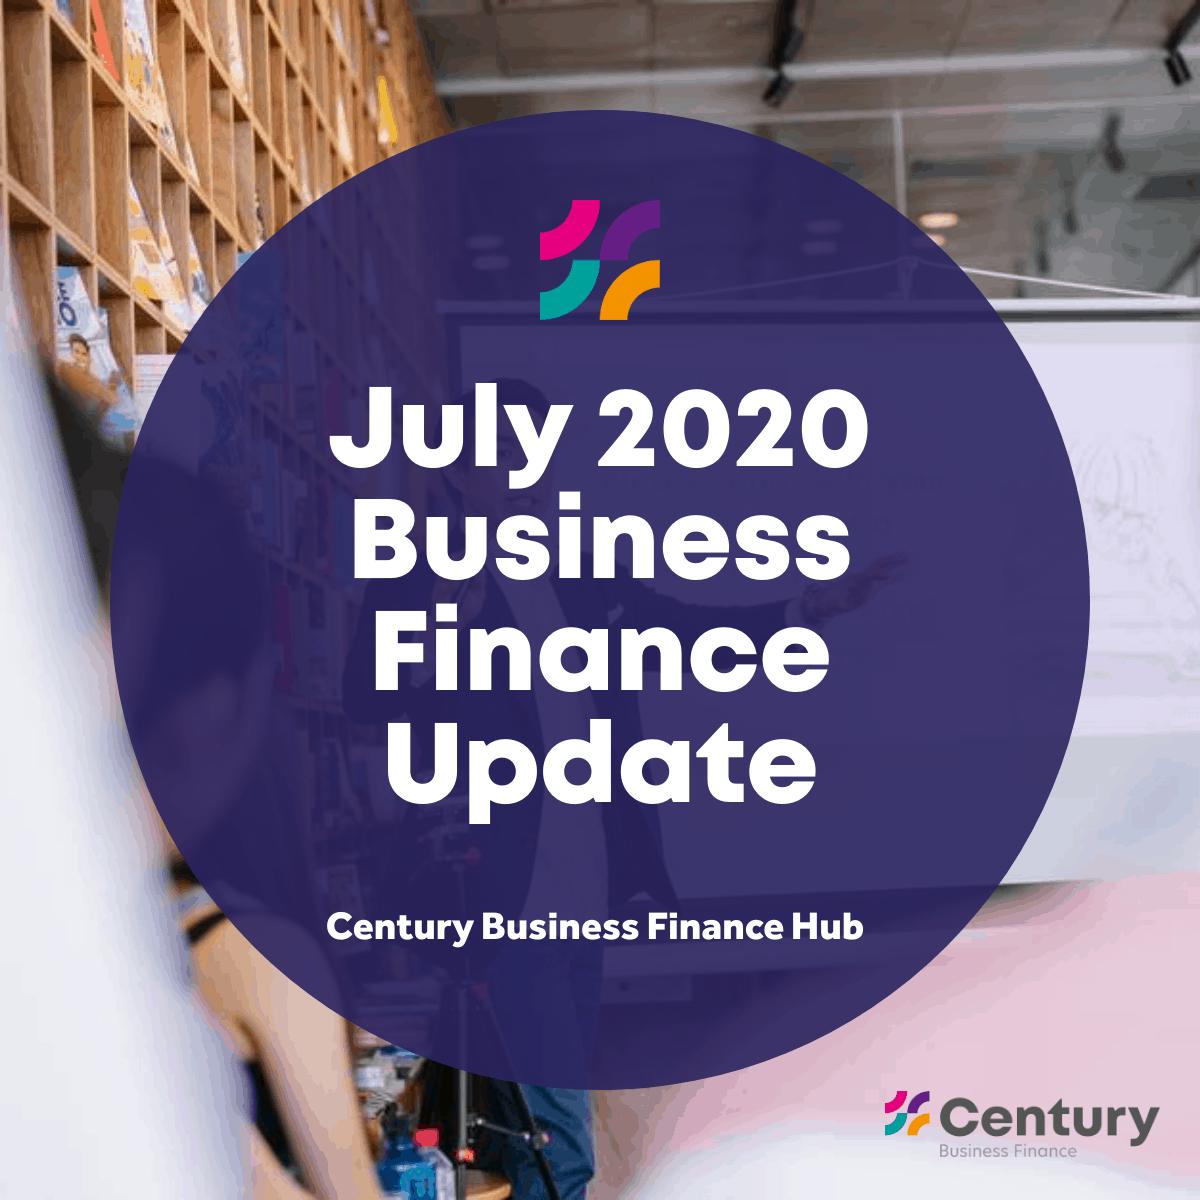 July 2020 Business Finance Update